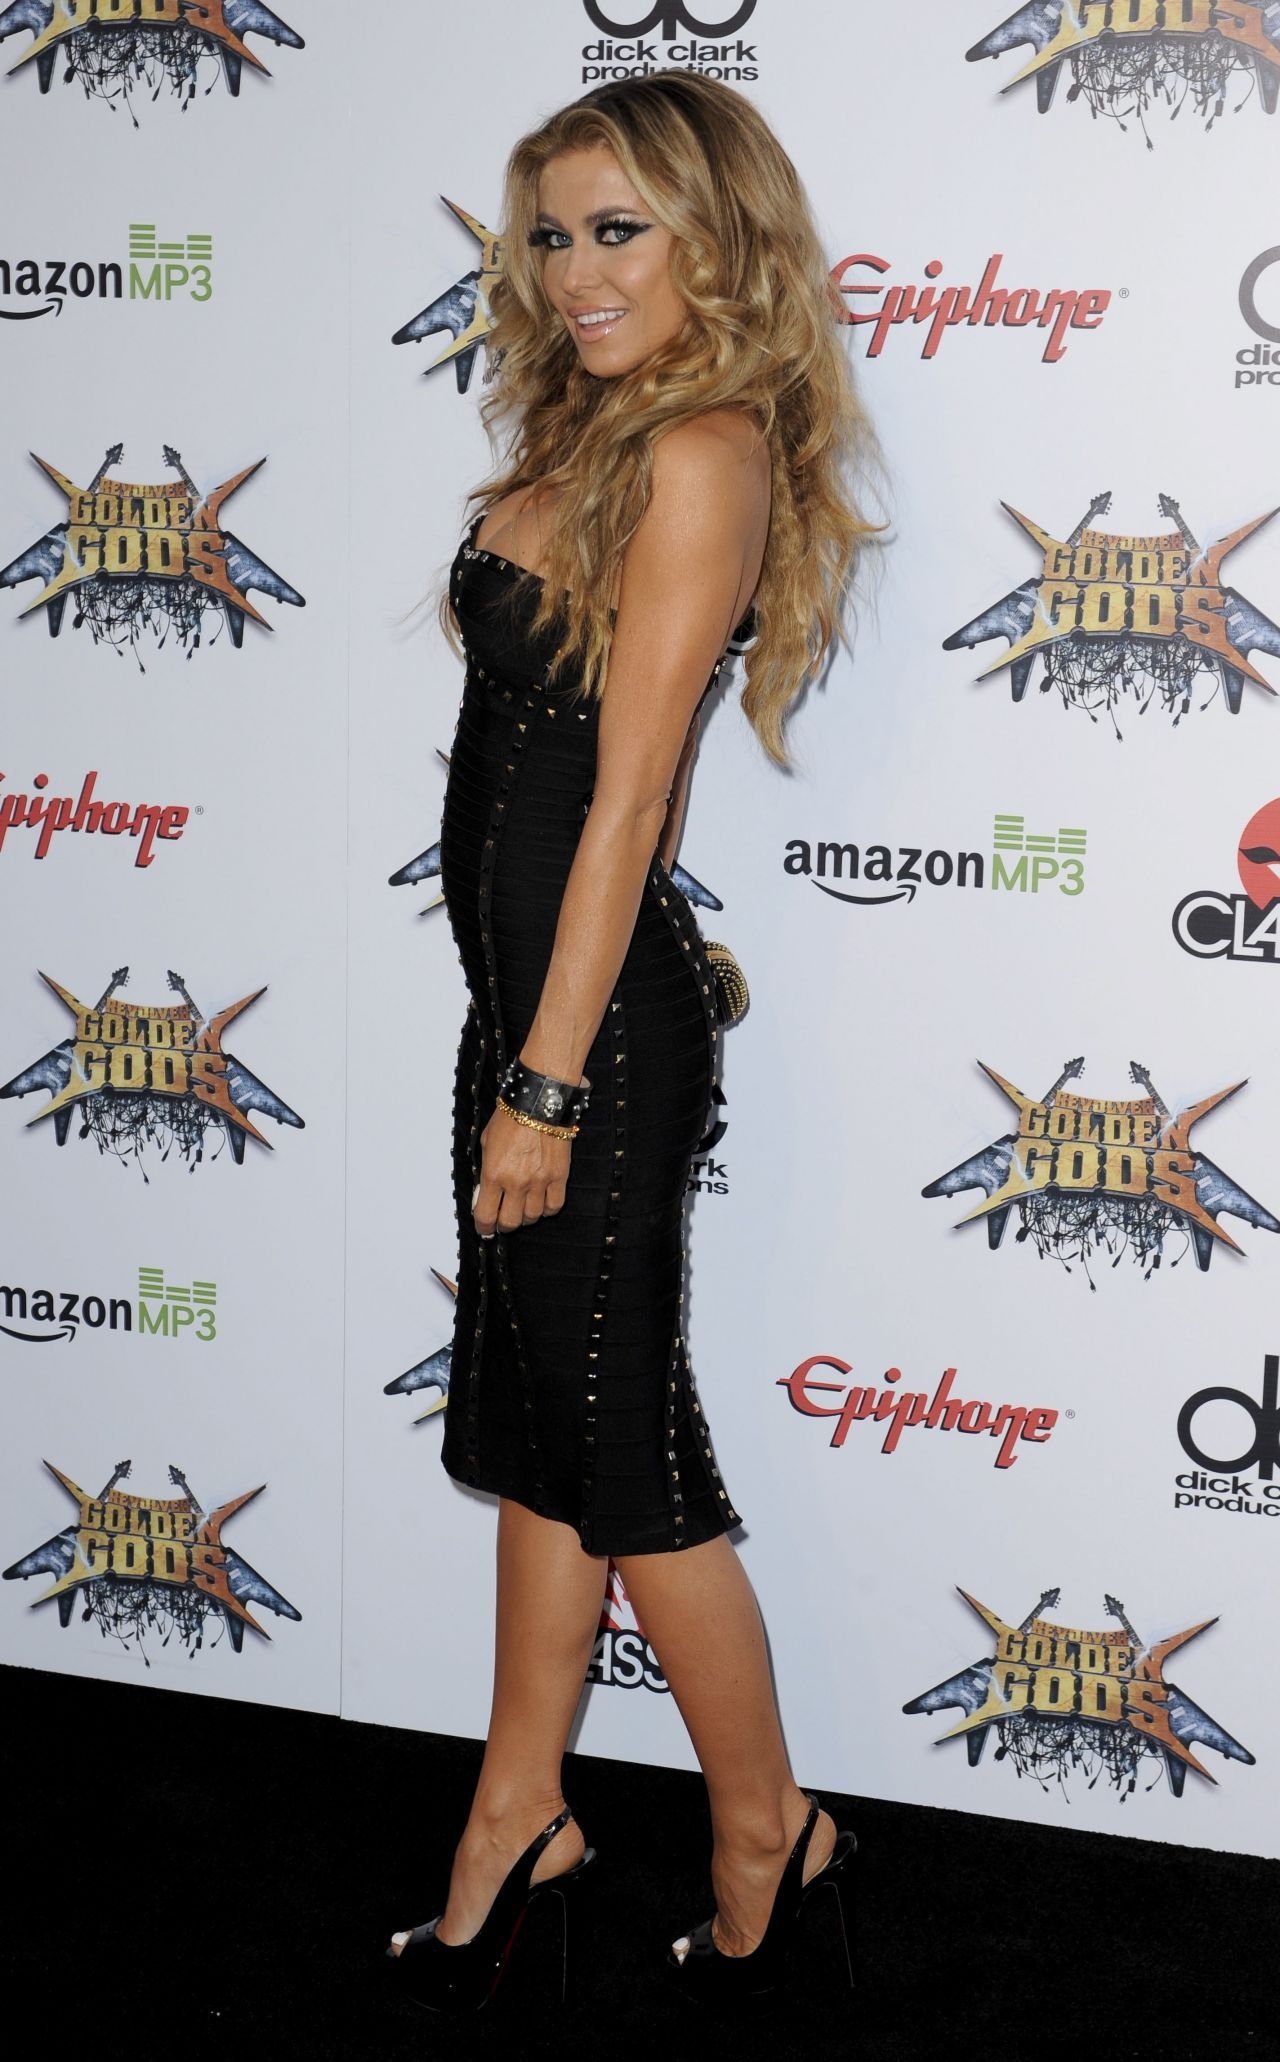 Carmen Electra 2014 Revolver Golden Gods Awards In Los